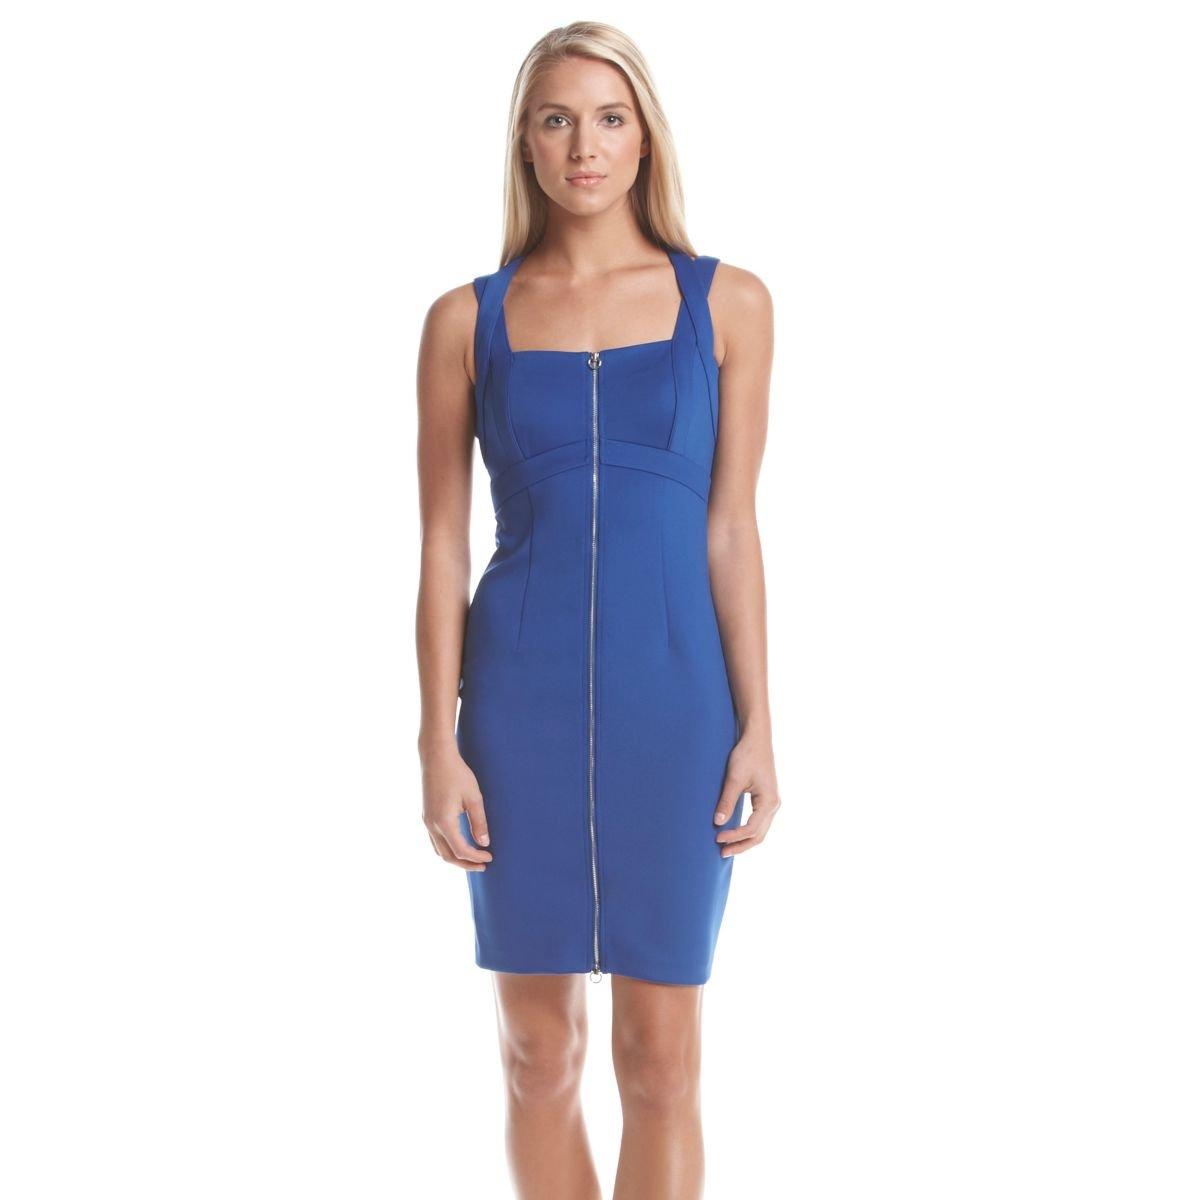 Calvin Klein Women's Zip Front Dress, Regatta, 10